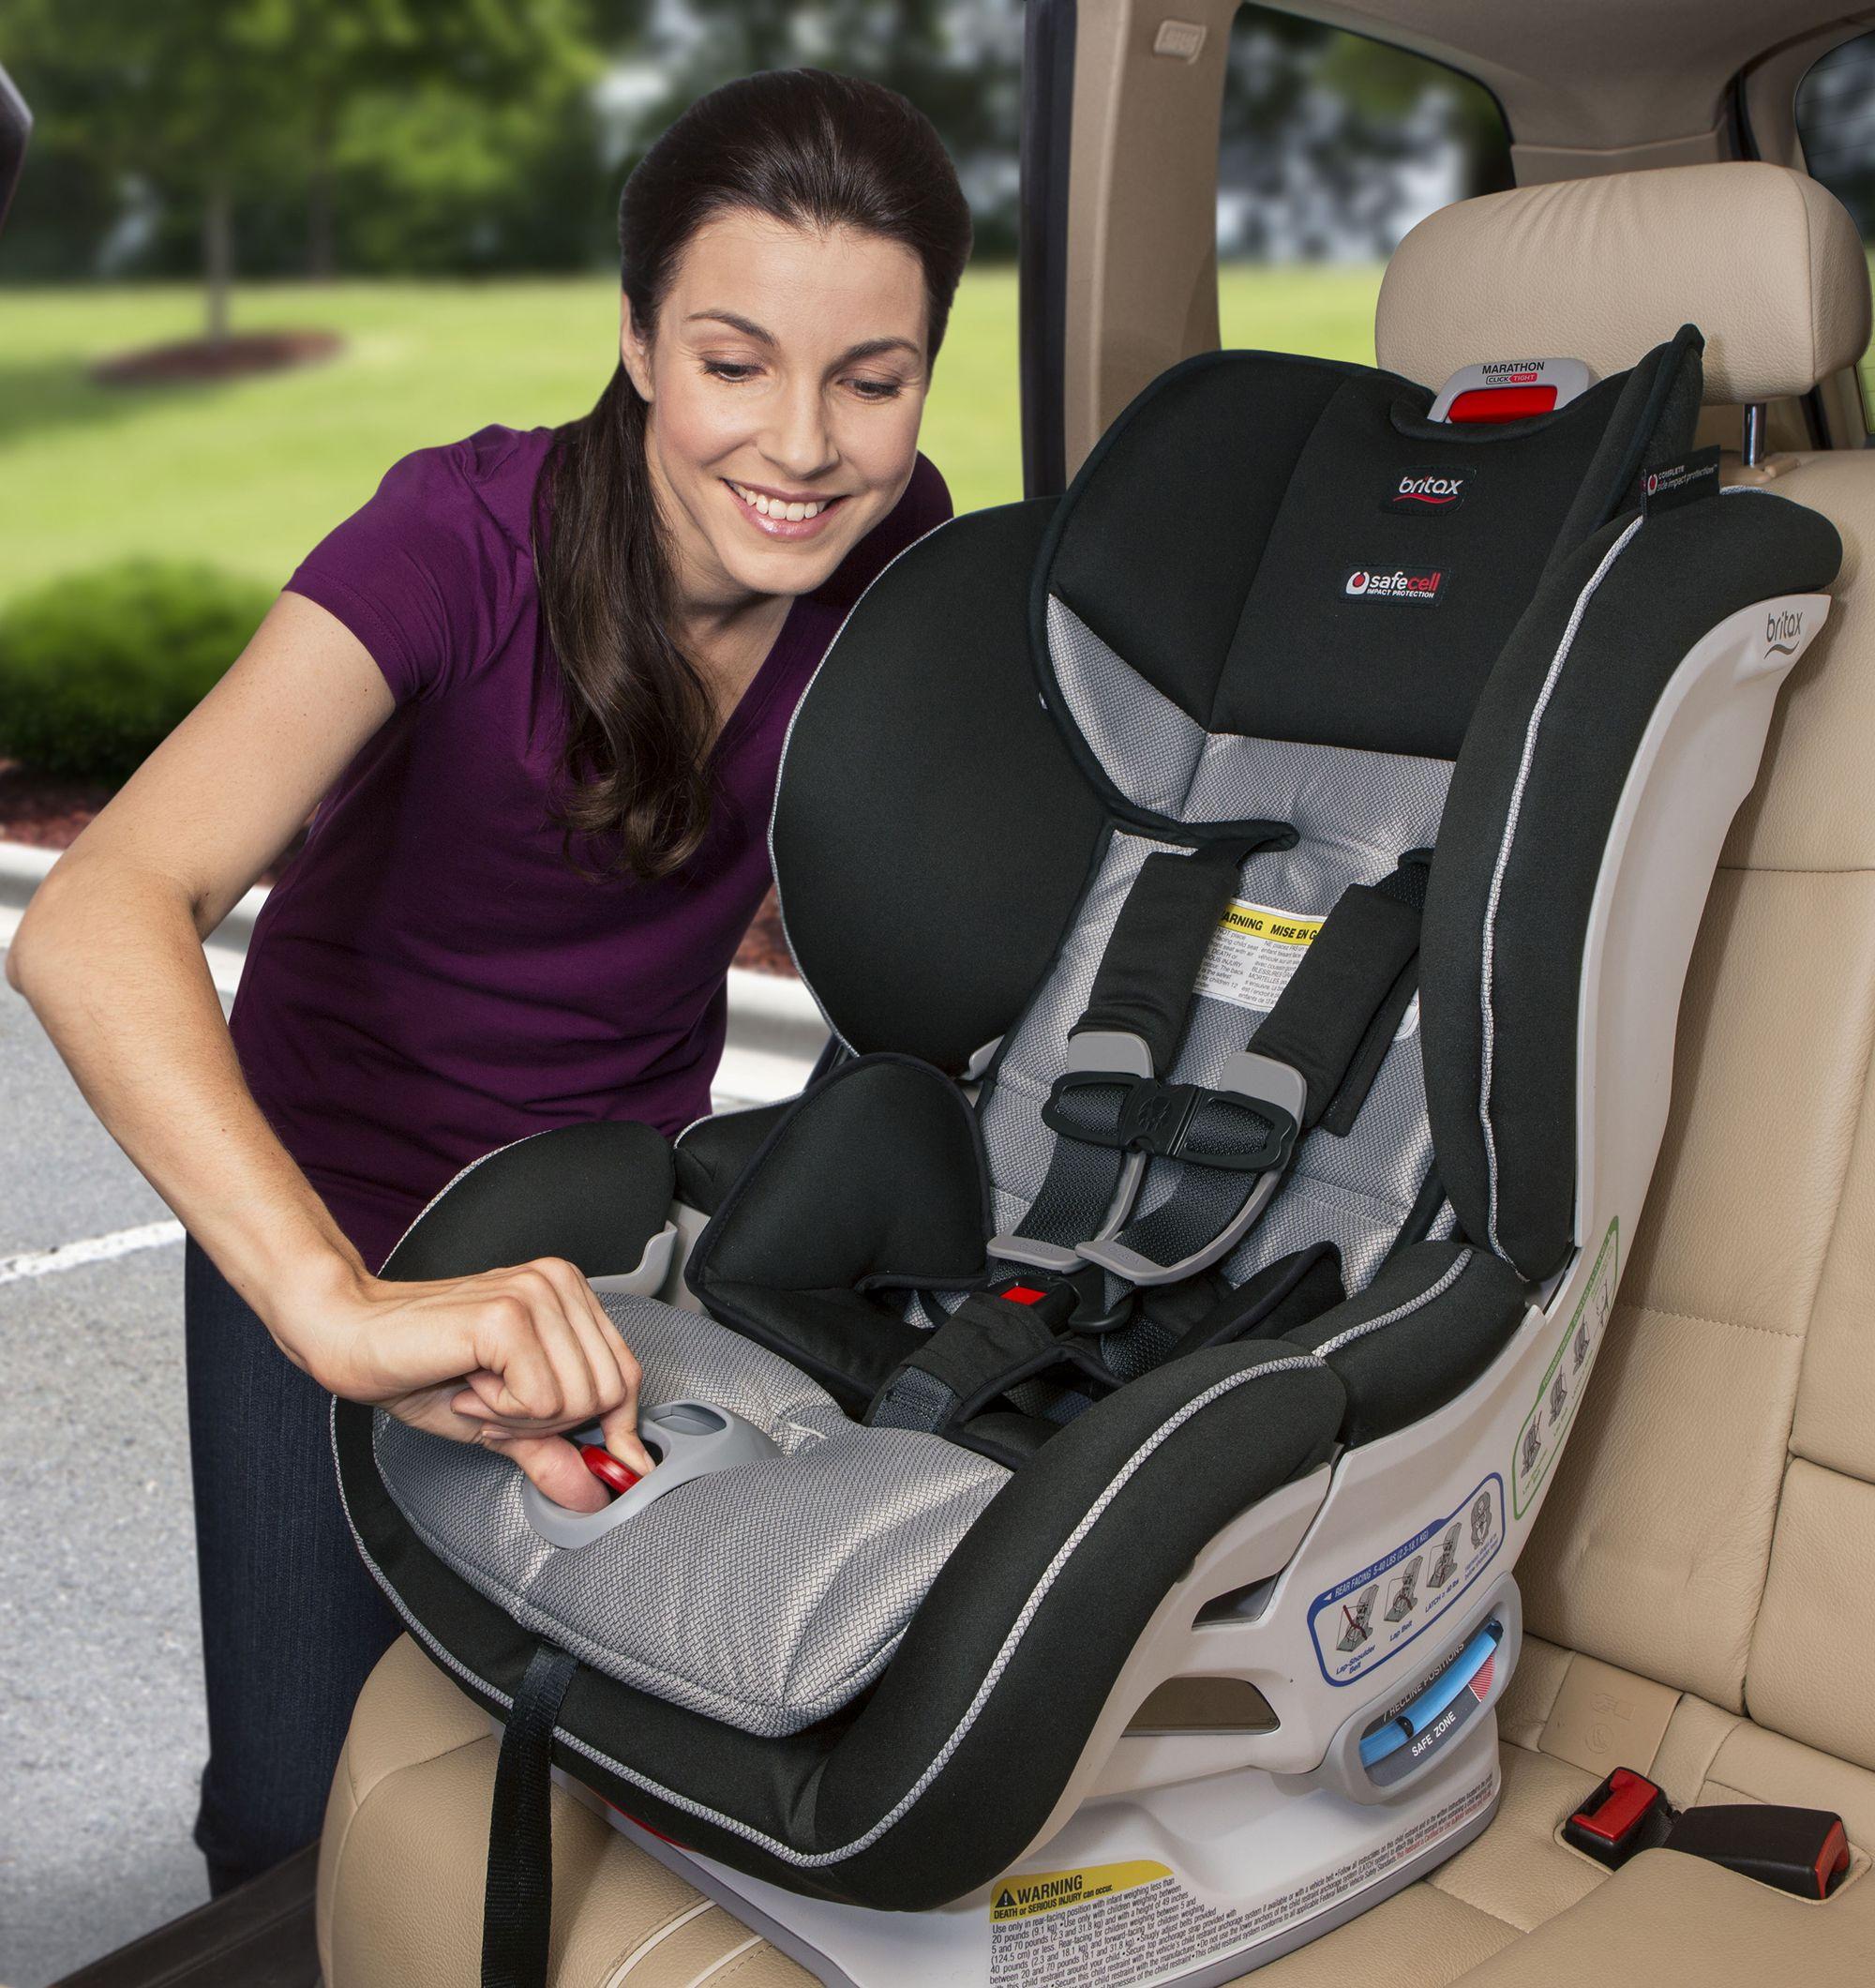 The Britax Marathon Clicktight Makes Car Seat Installation As Simple As Buckling A Seat Belt Bruexc Britax Marathon Clicktight Britax Marathon Baby Car Seats